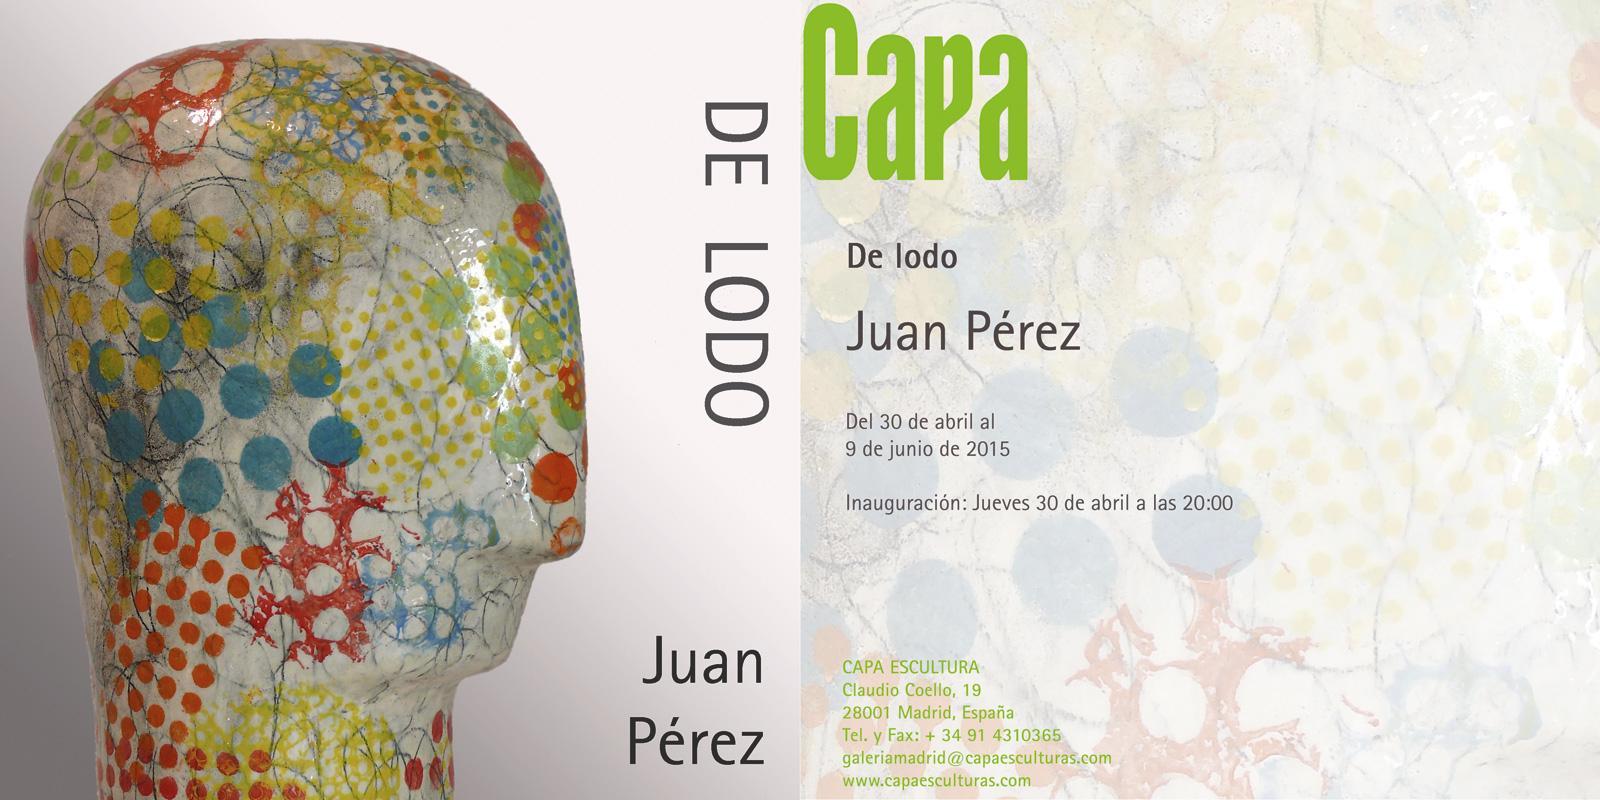 Invitación a la exposición de Juan Pérez